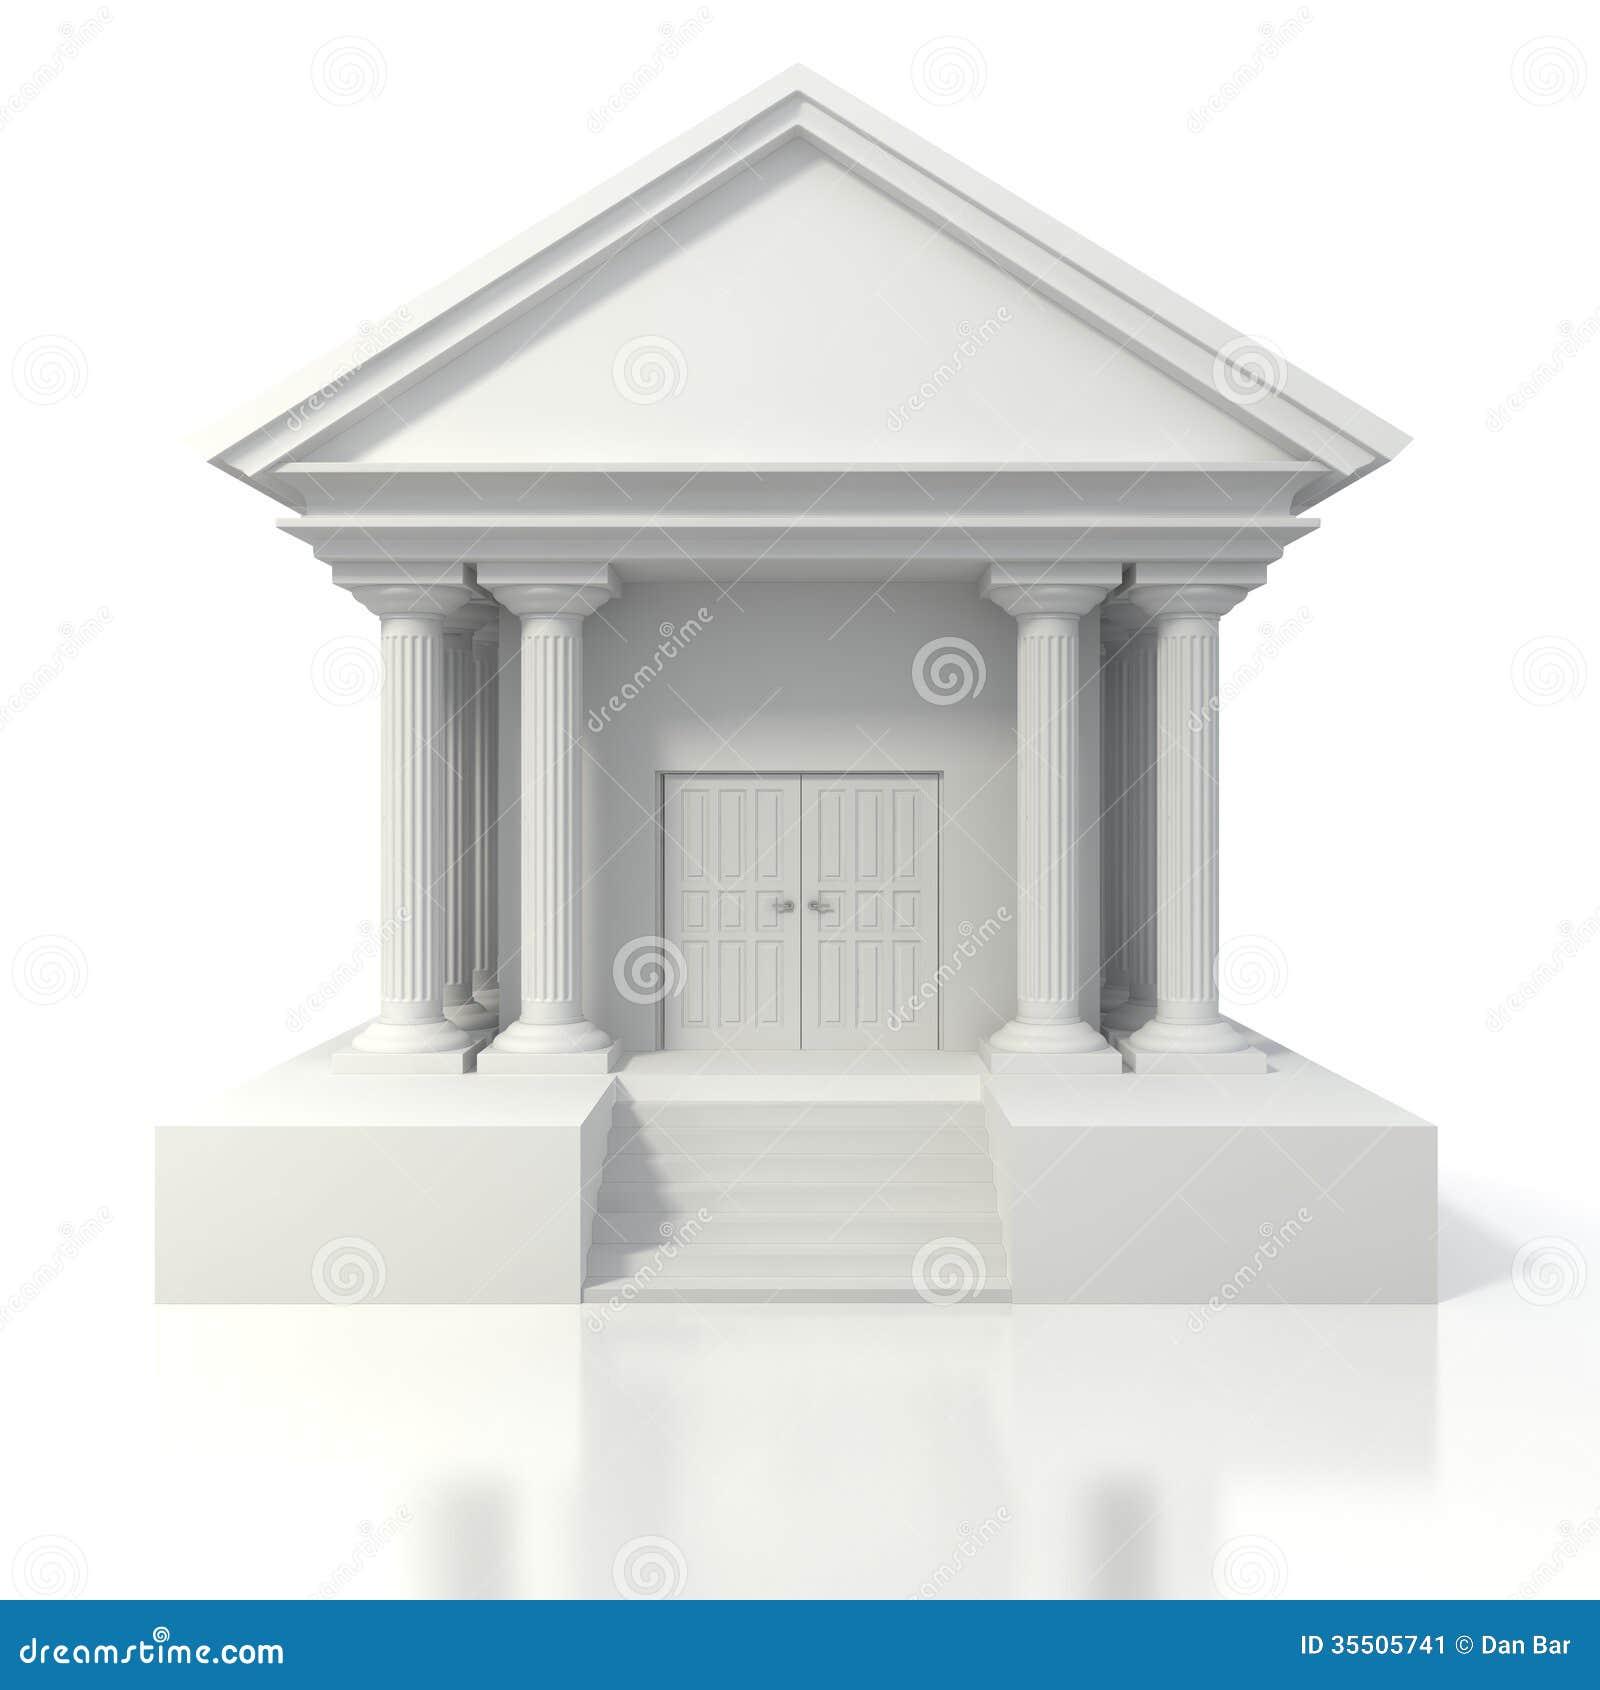 Banco Building Clipart